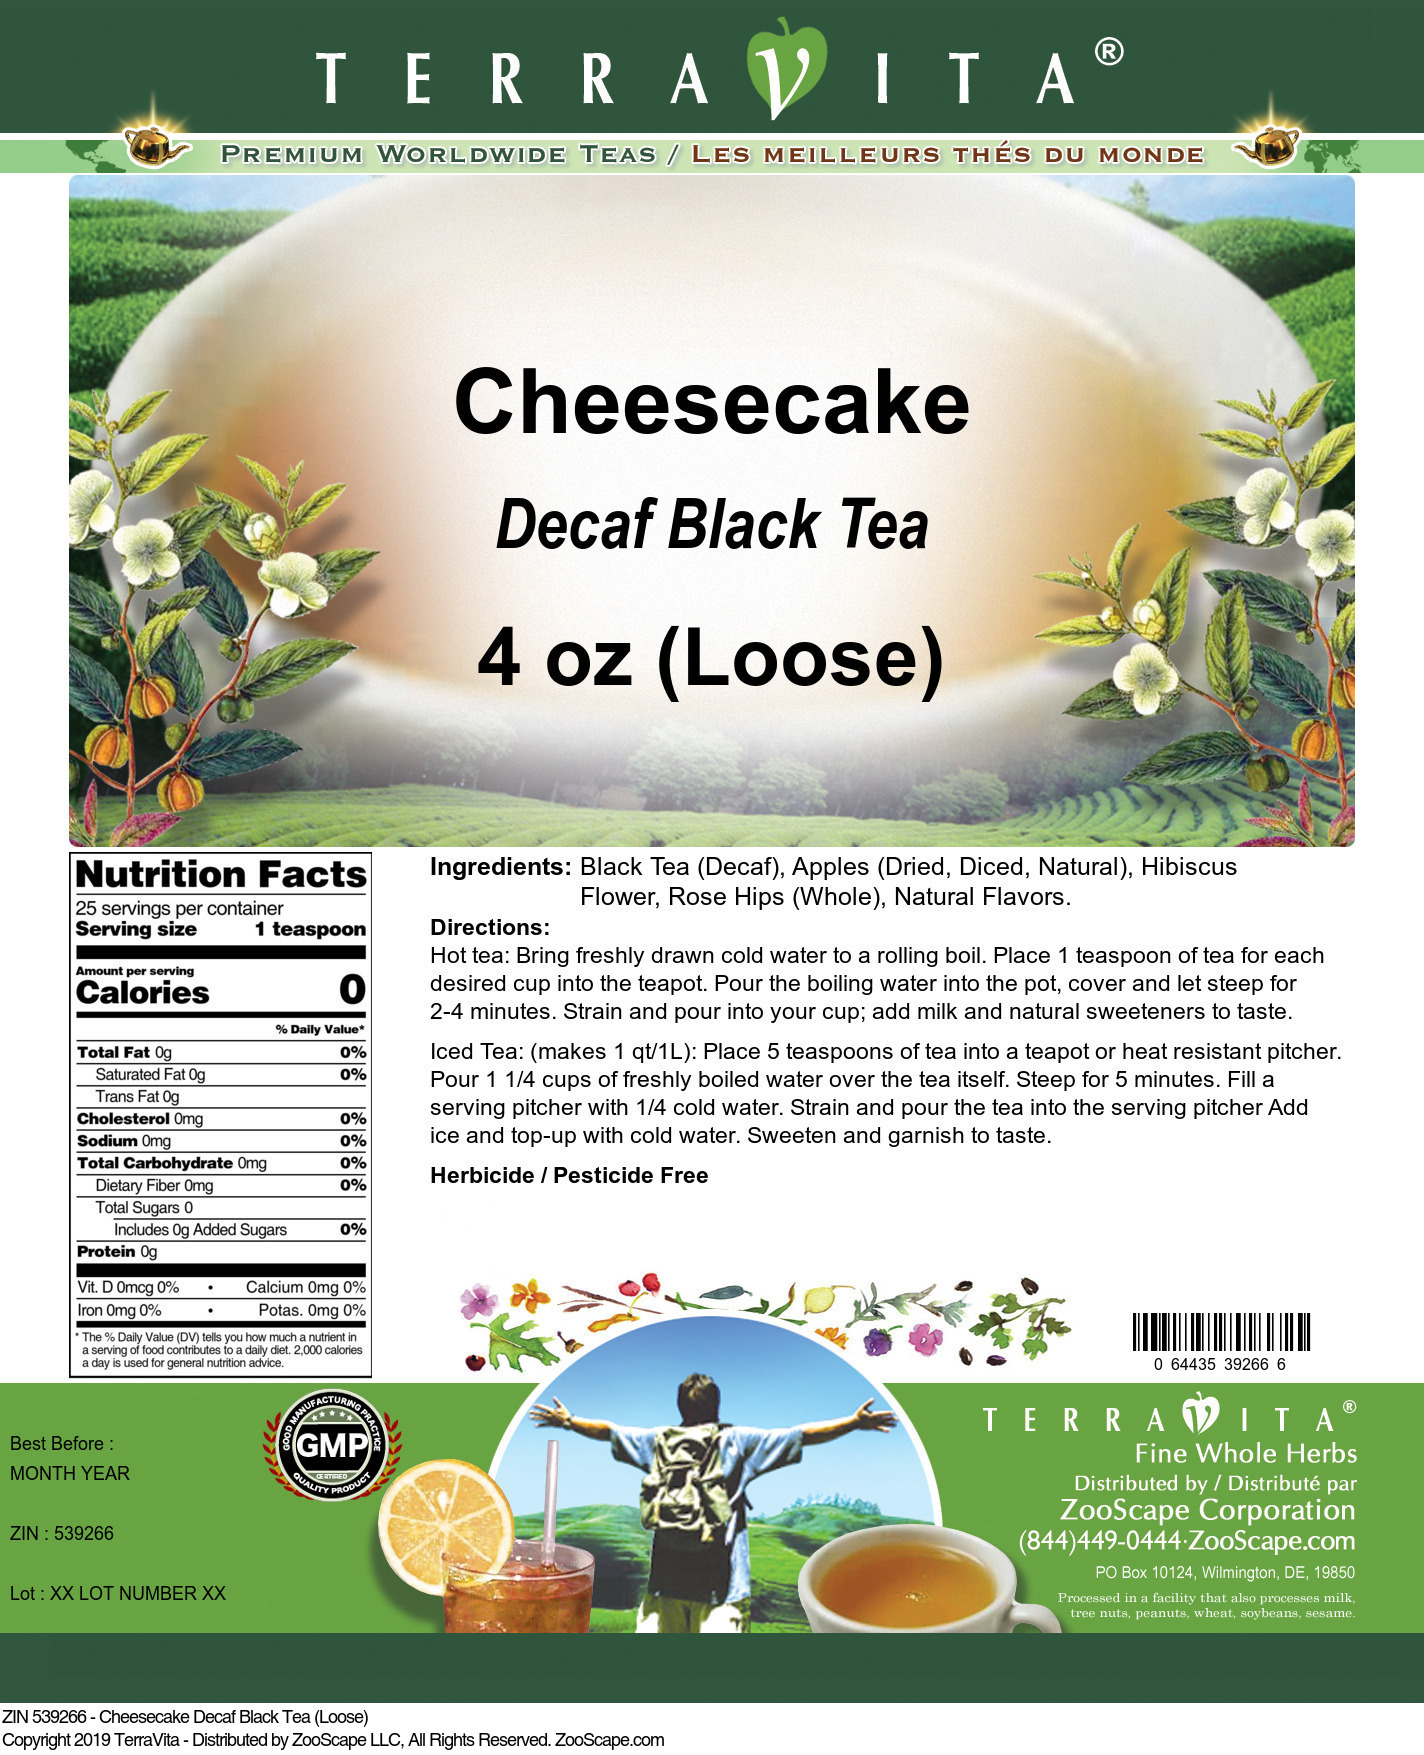 Cheesecake Decaf Black Tea (Loose)